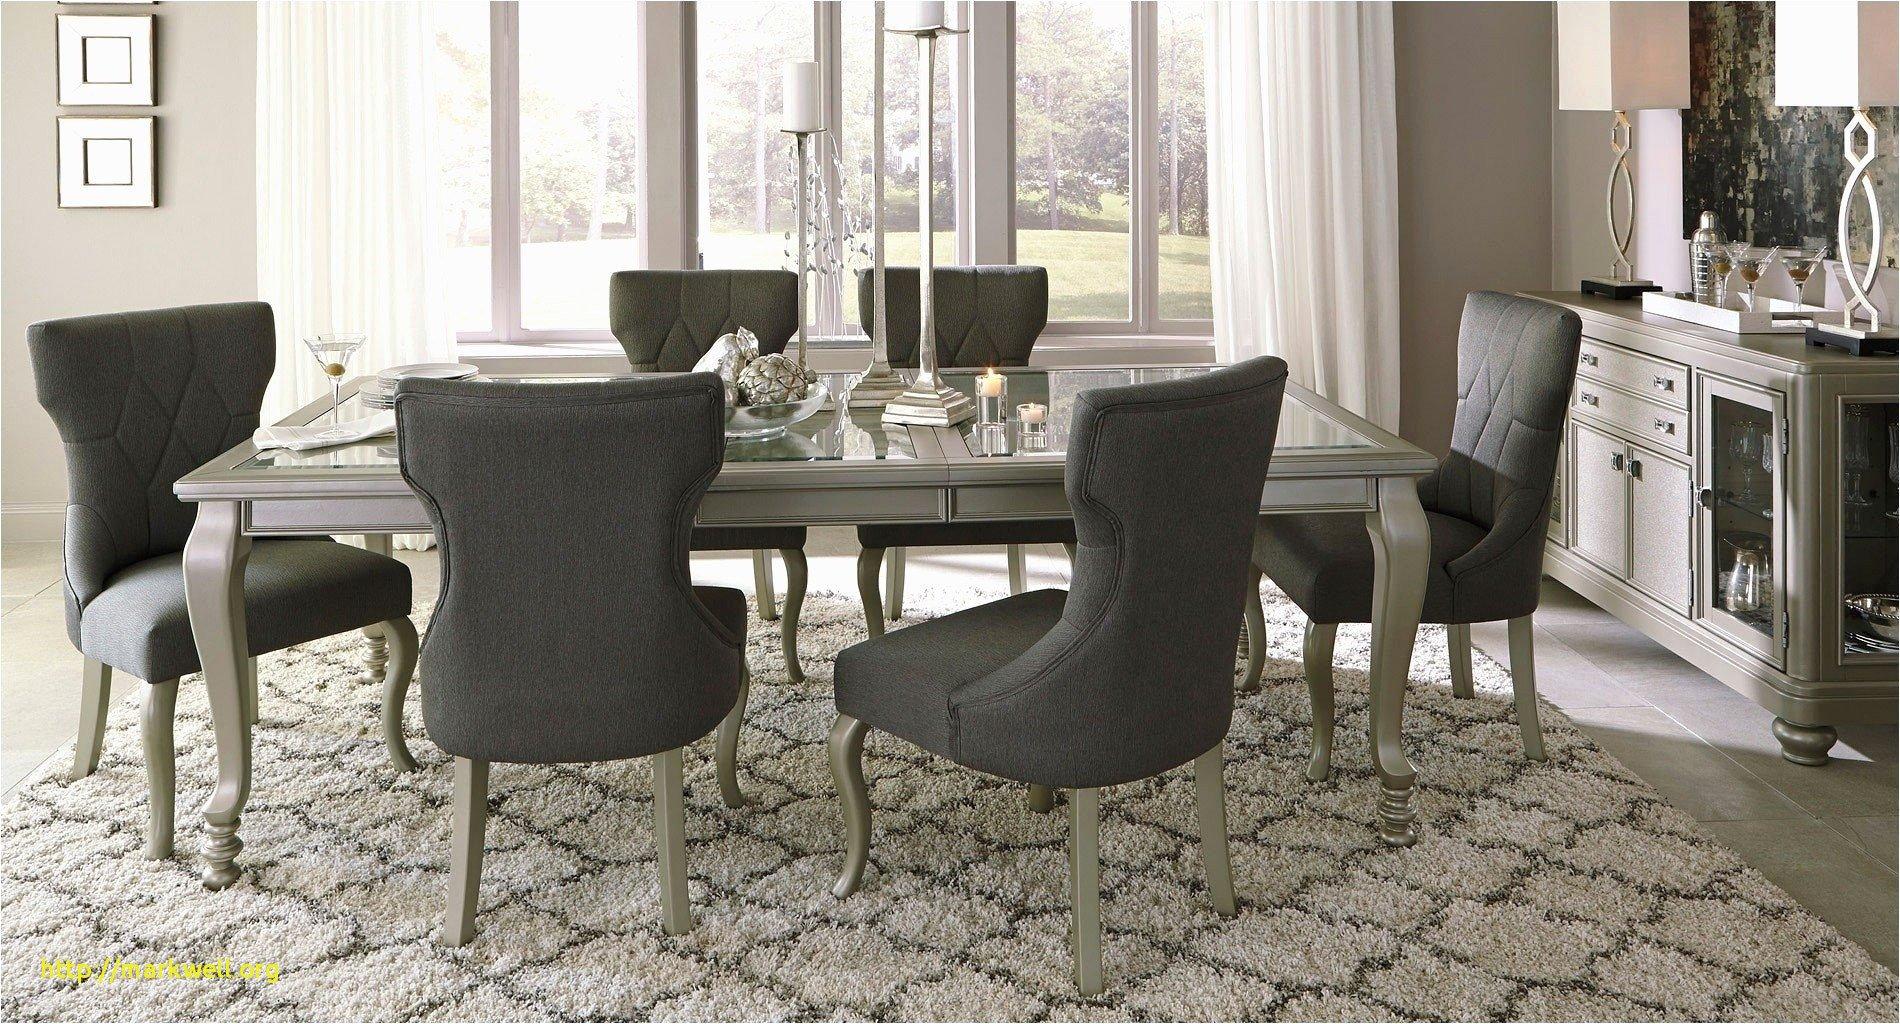 High End Bedroom Furniture Elegant Luxury Side Chairs for Bedroom